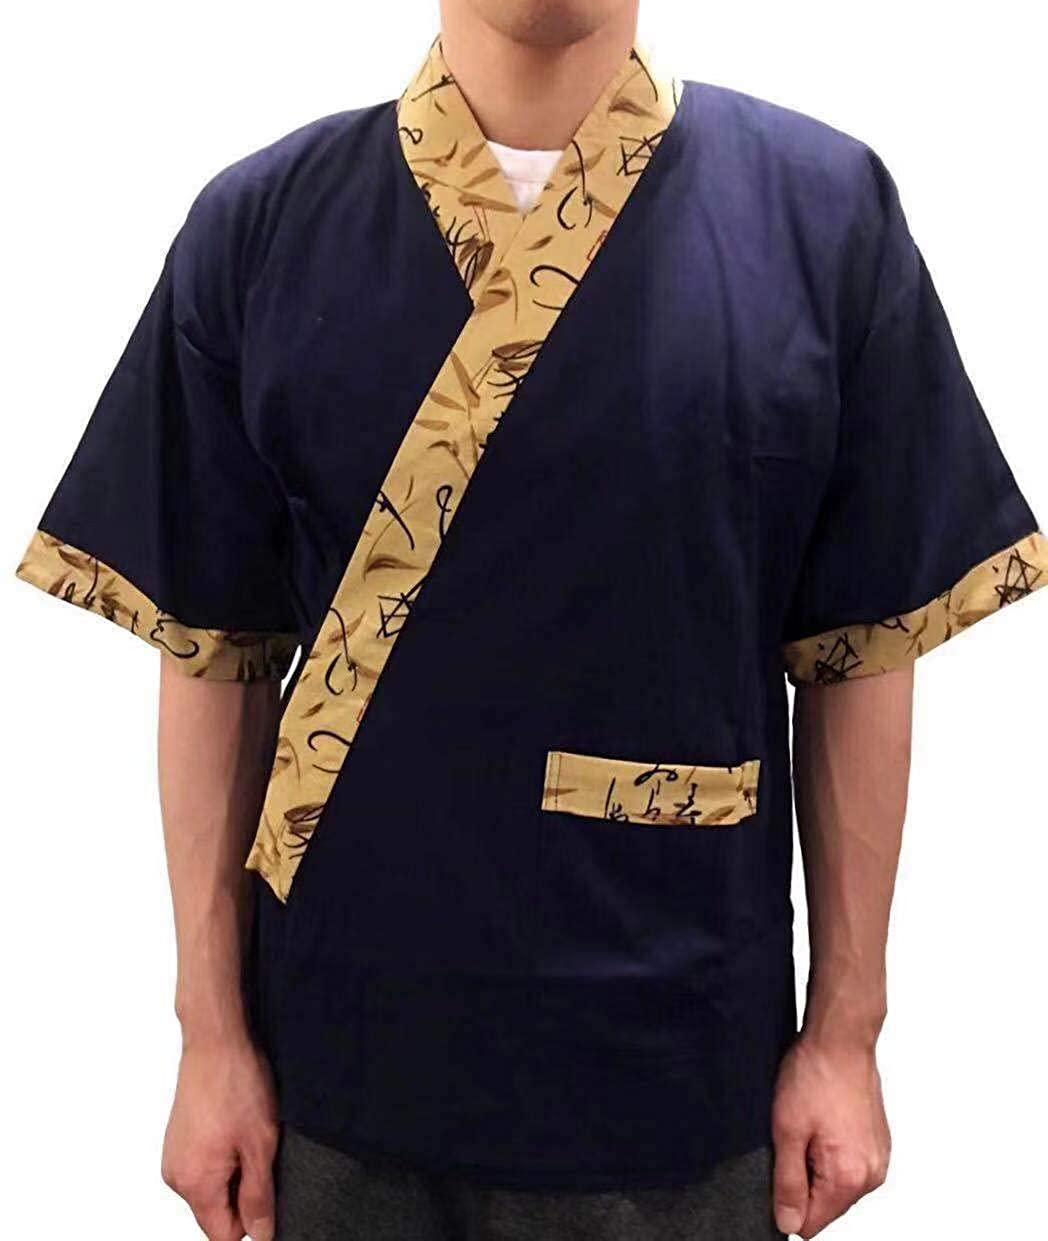 QJG Durable Cotton Sushi Chef Jacket Japanese Kitchen Uniform Kimono